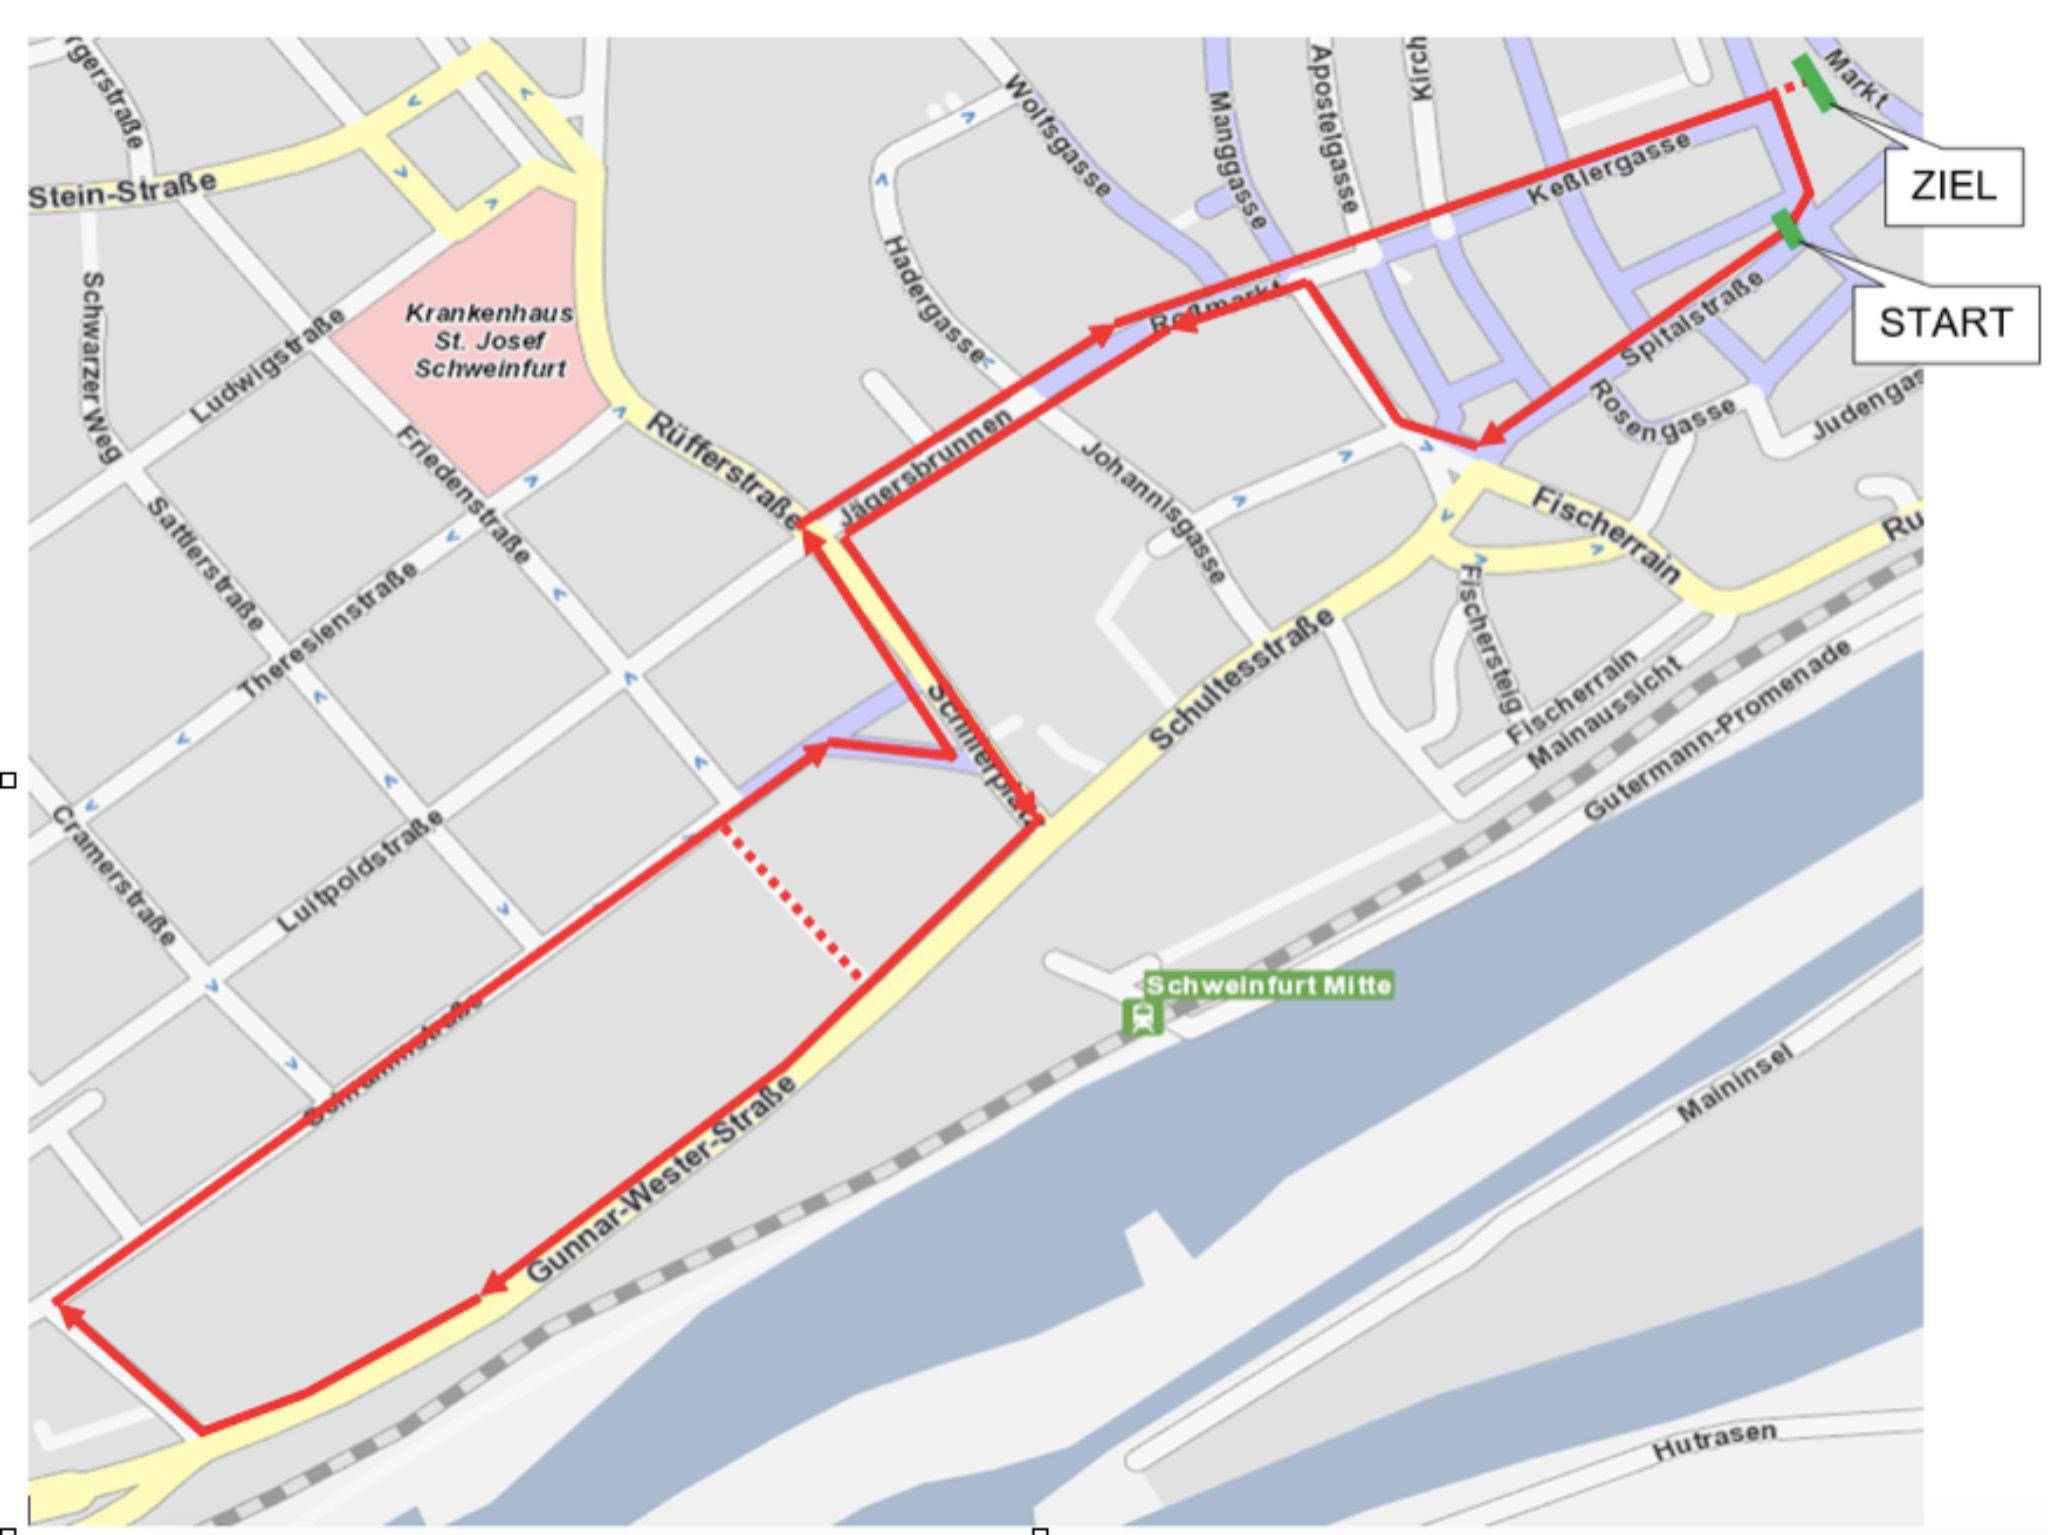 Streckenverlauf des AOK-MainCityRun in Schweinfurt. Grafik: AOK-MainCityRun